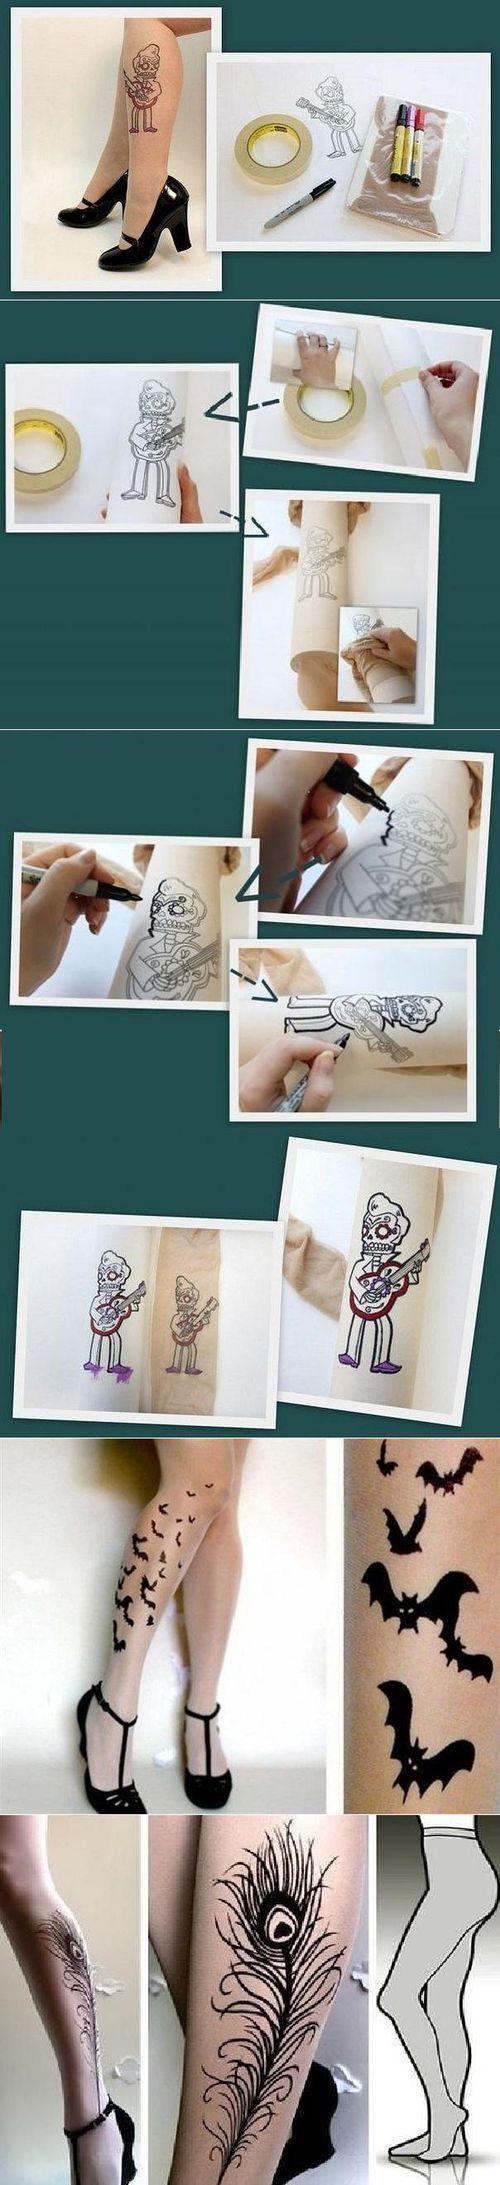 DIY Pantyhose Tattoo DIY Projects / UsefulDIY.com